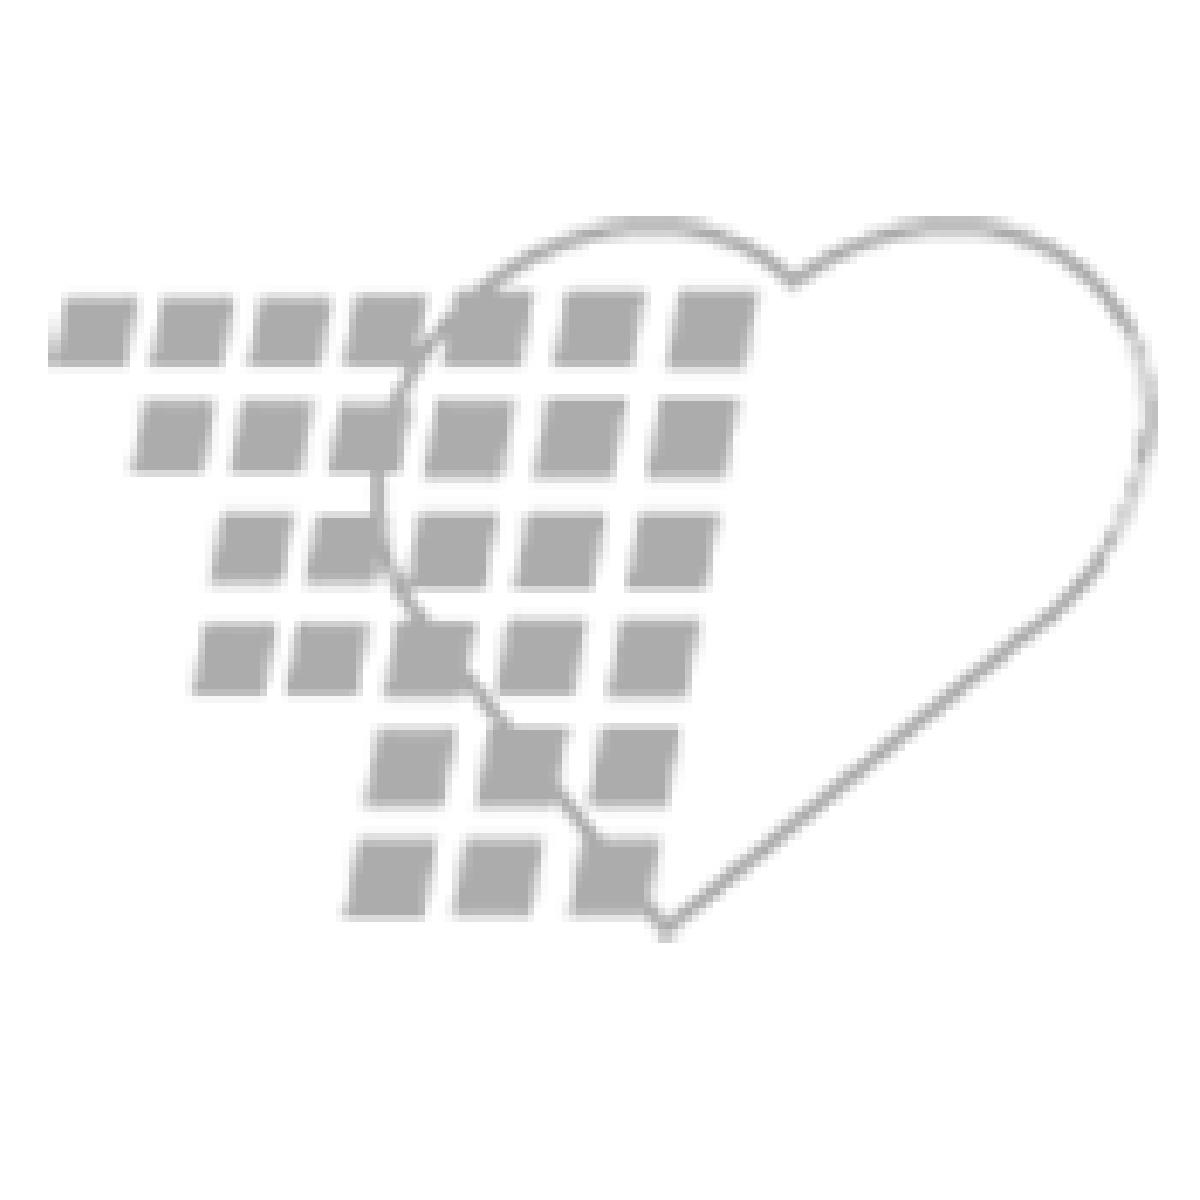 06-93-9026 - Demo Dose® Bottle of Aspirn 81mg